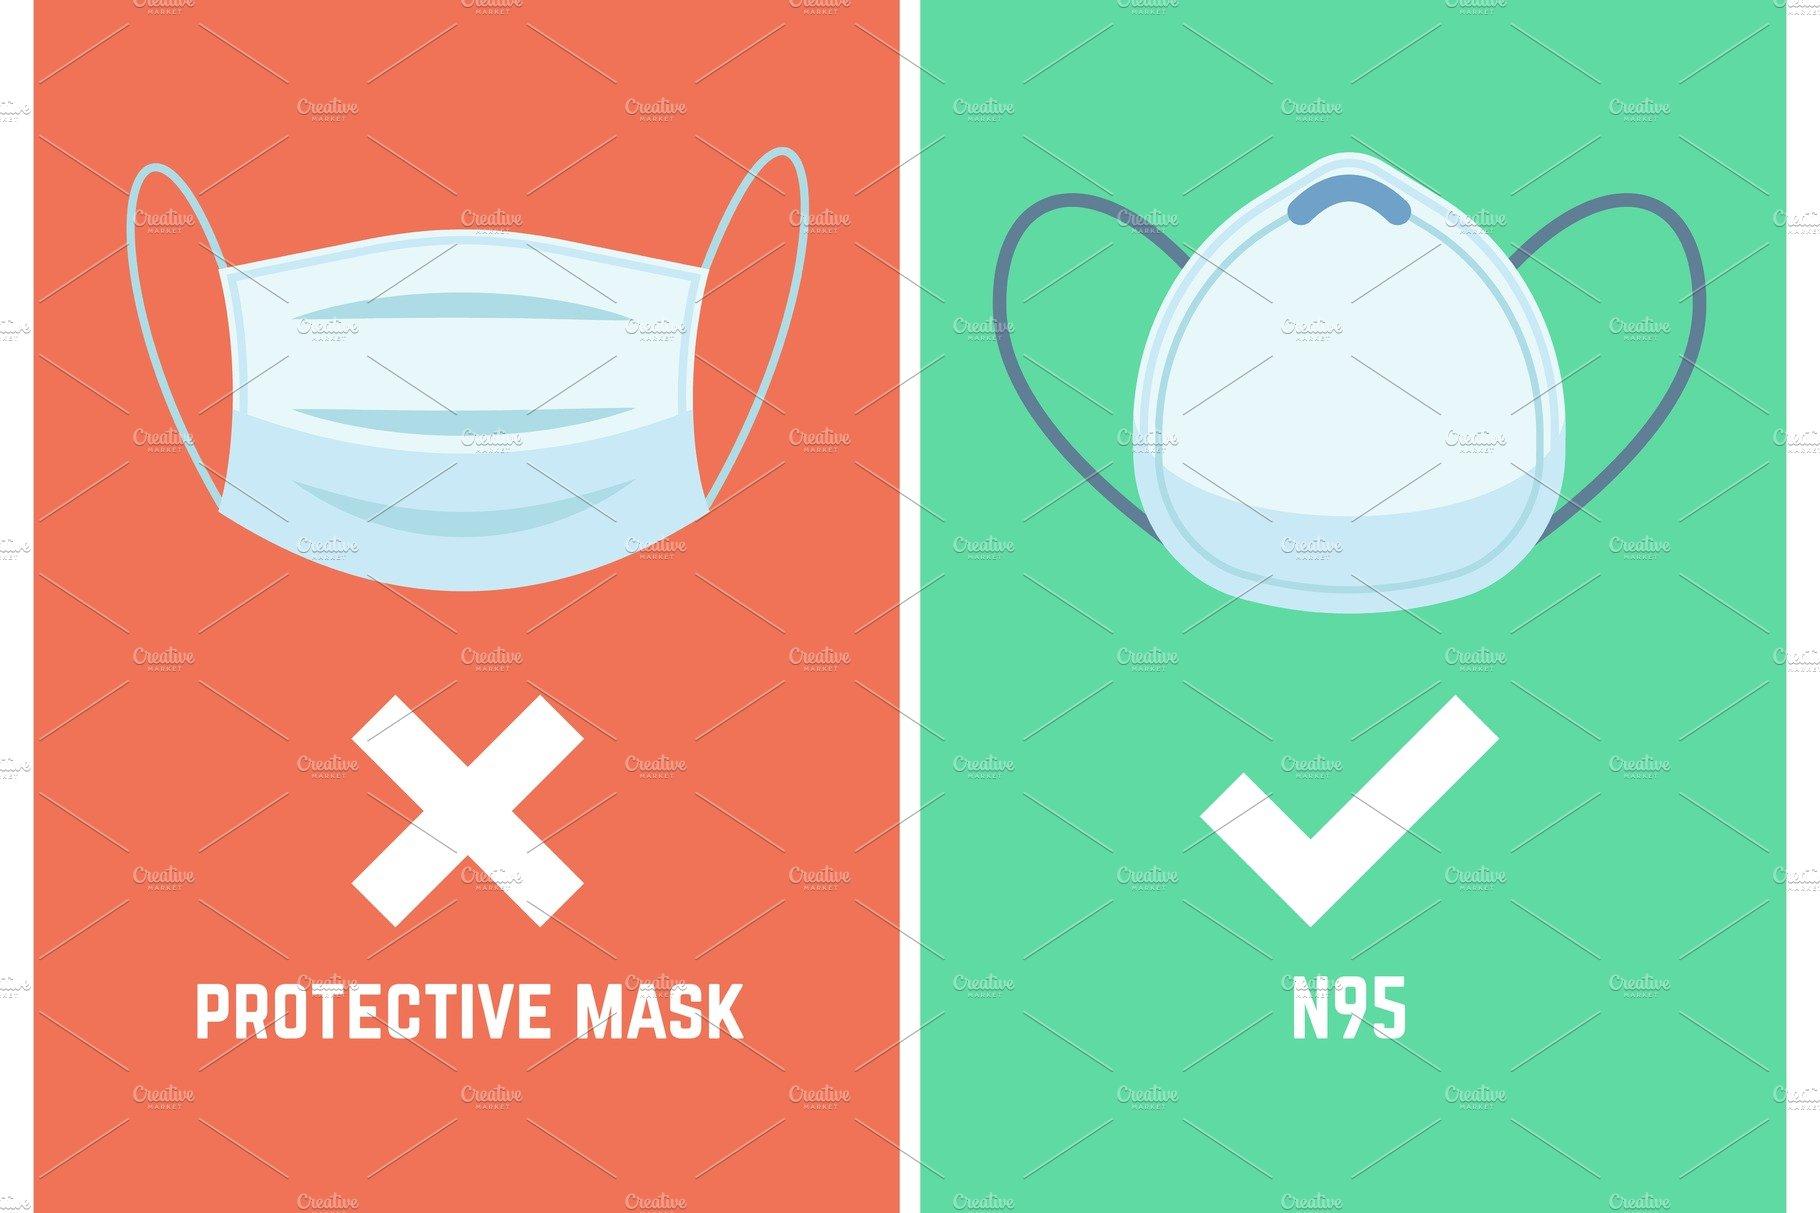 Masks Pollution Face Dust Mask N95